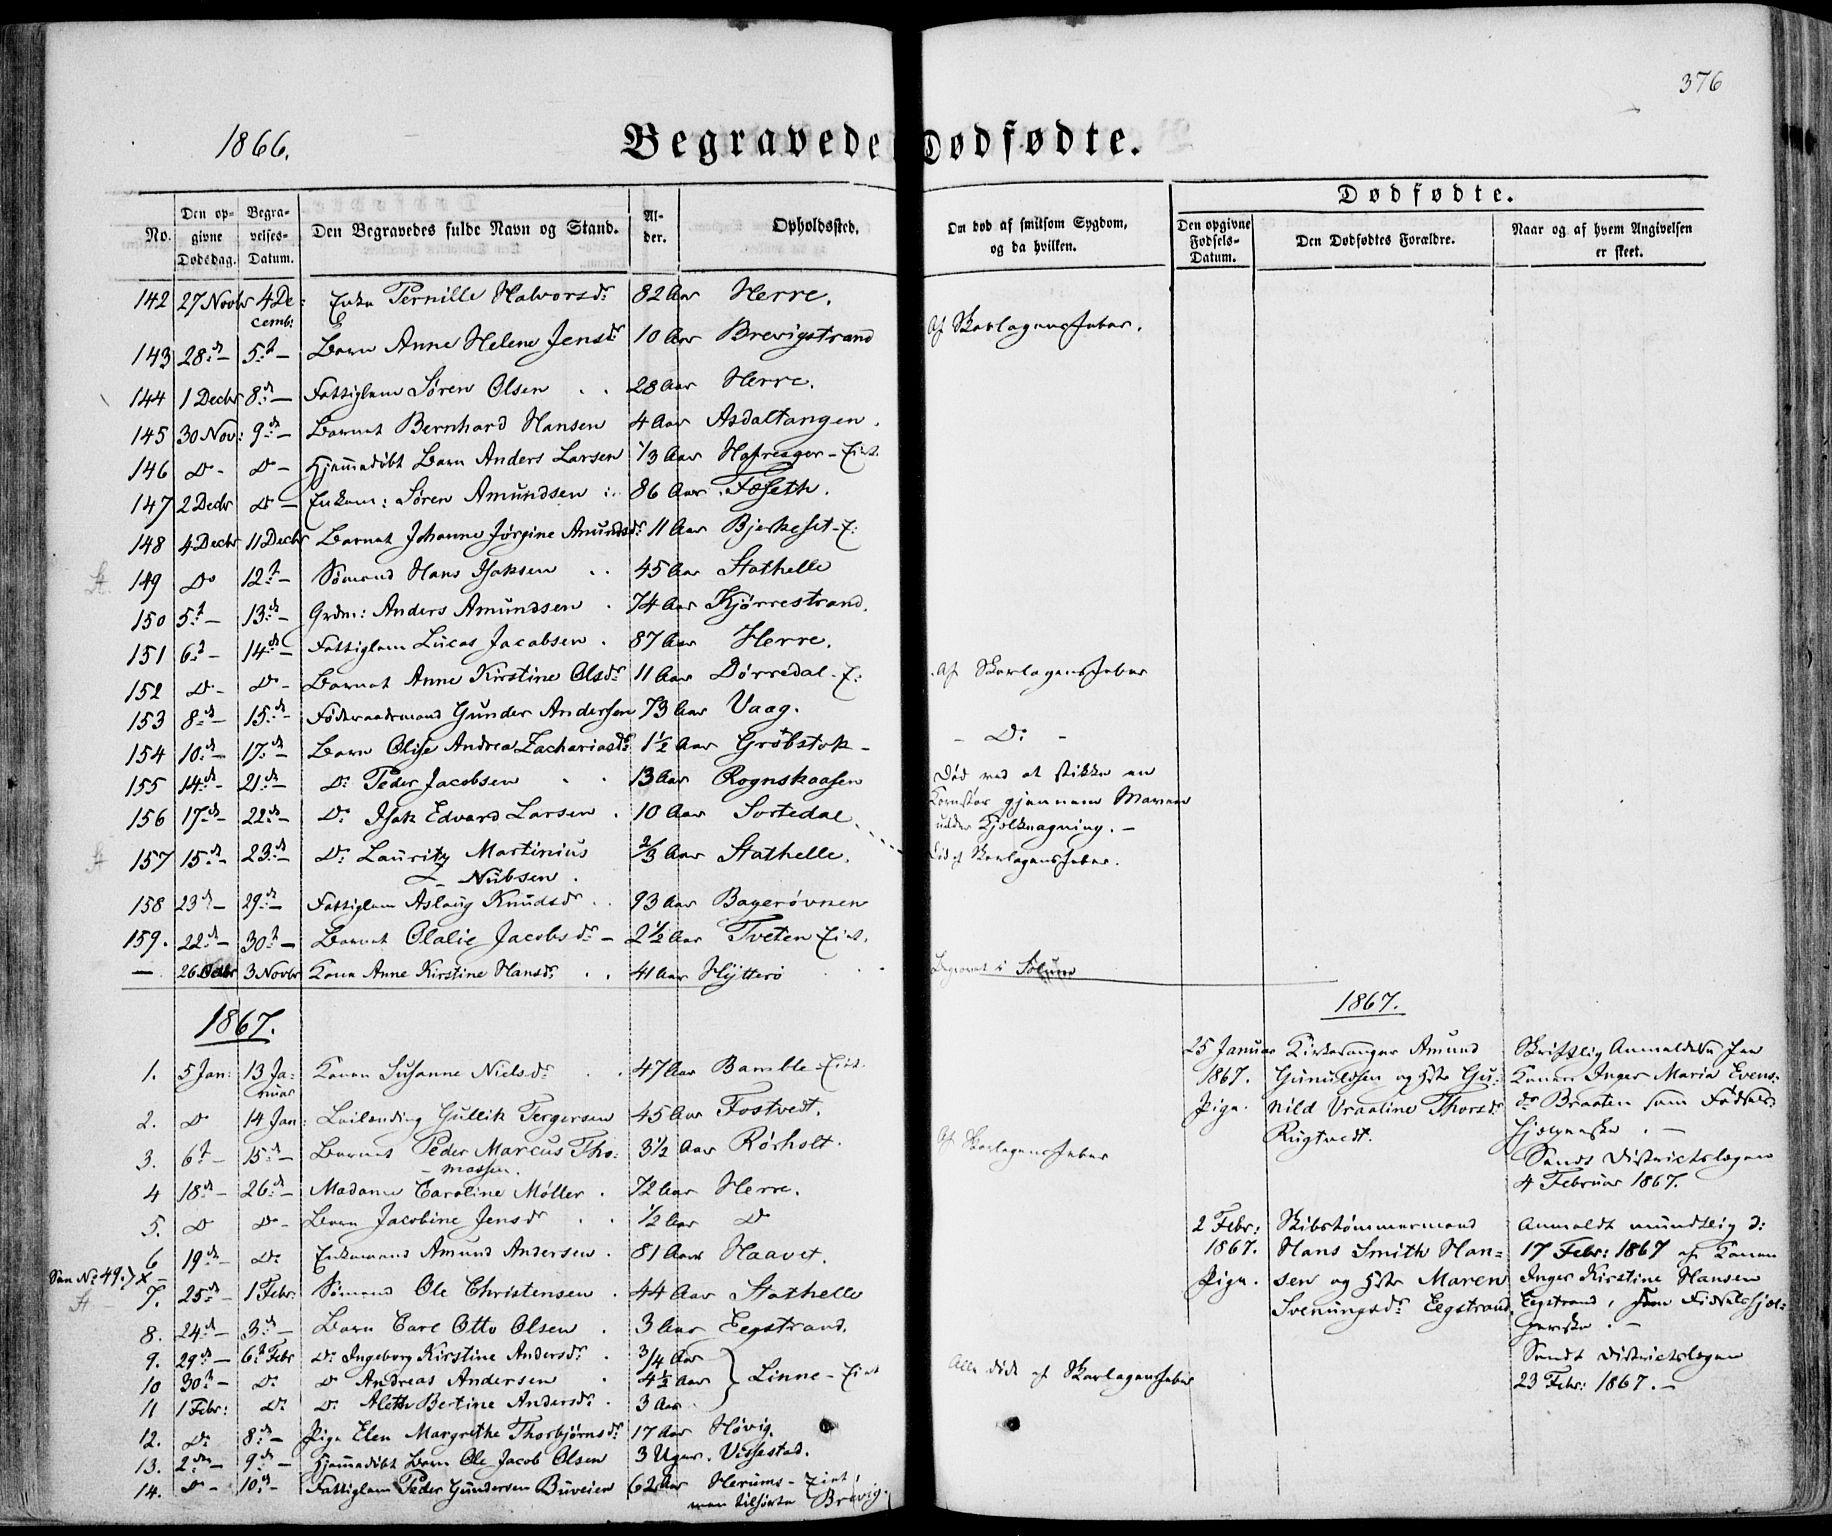 SAKO, Bamble kirkebøker, F/Fa/L0005: Ministerialbok nr. I 5, 1854-1869, s. 376